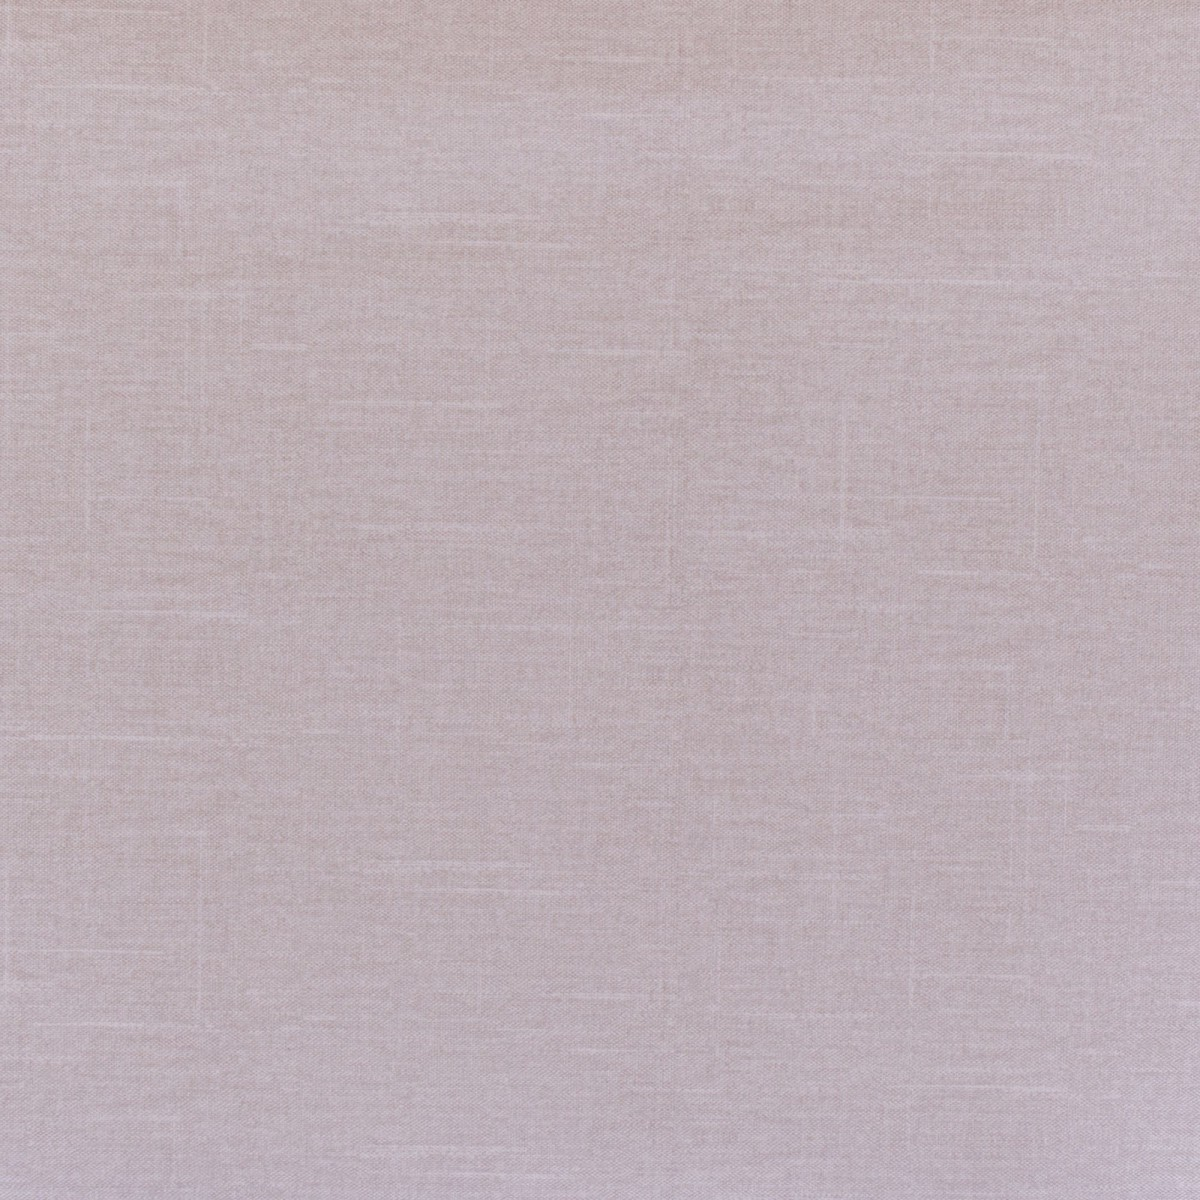 Обои флизелиновые Villa Borghese 1.06х10 м фон фиолетовый R1306